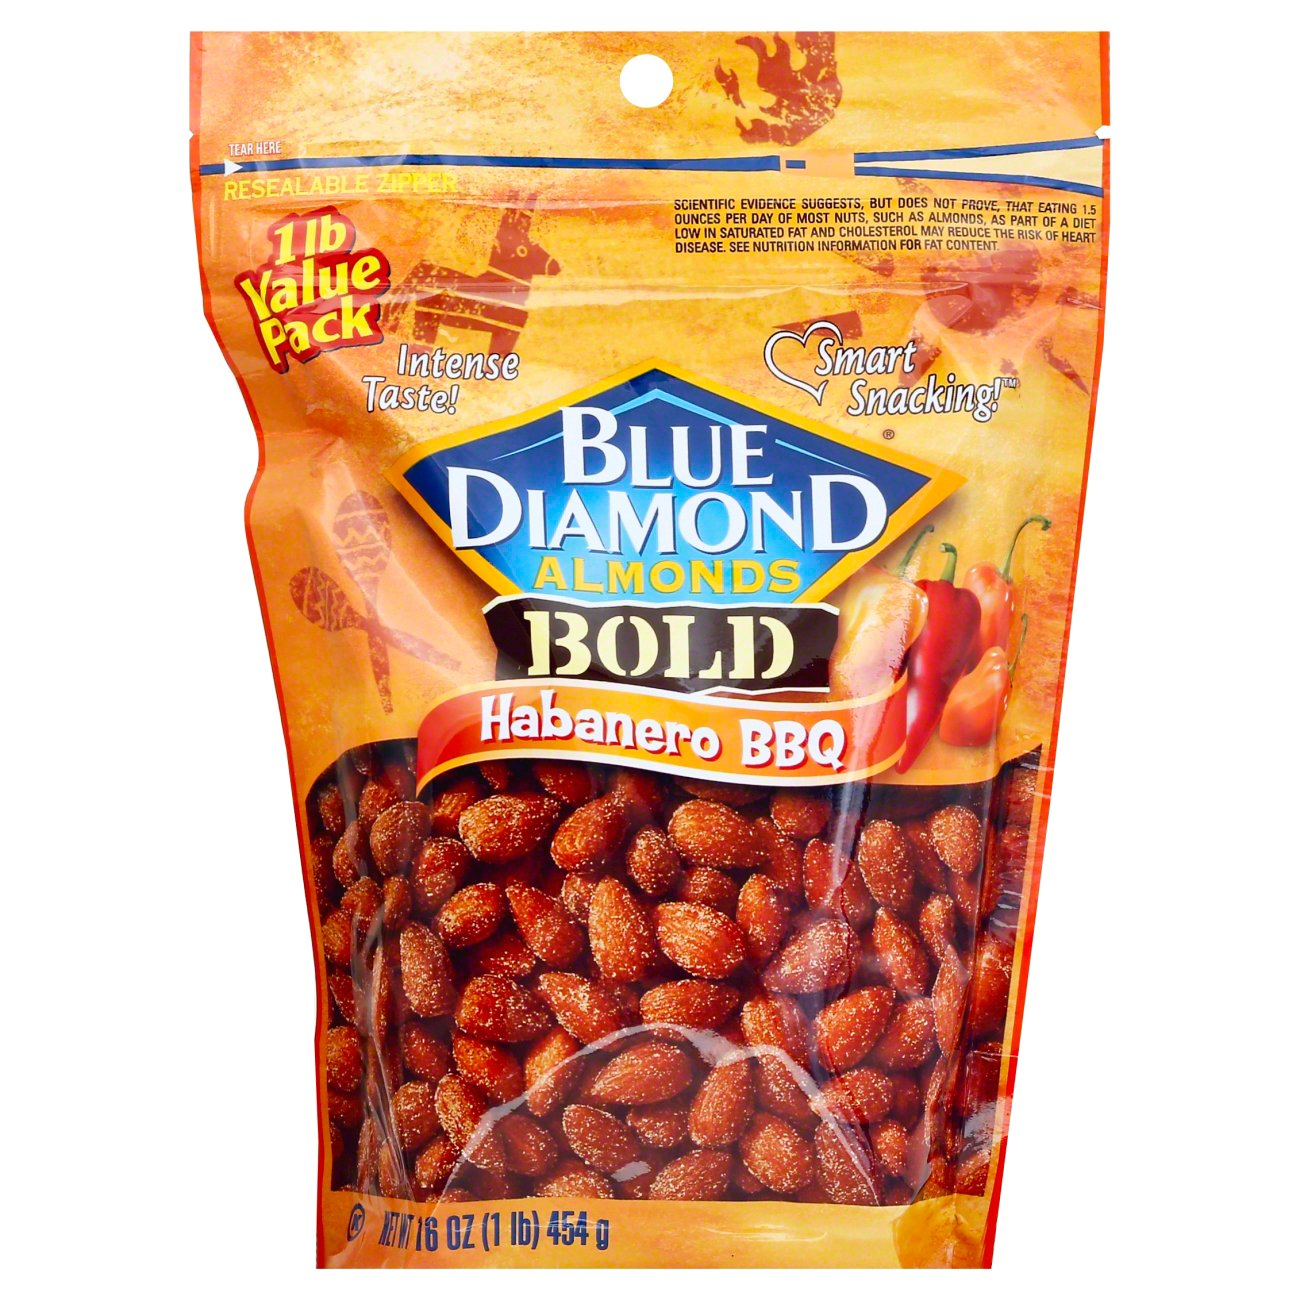 Blue Diamond Bold Habanero BBQ Almonds